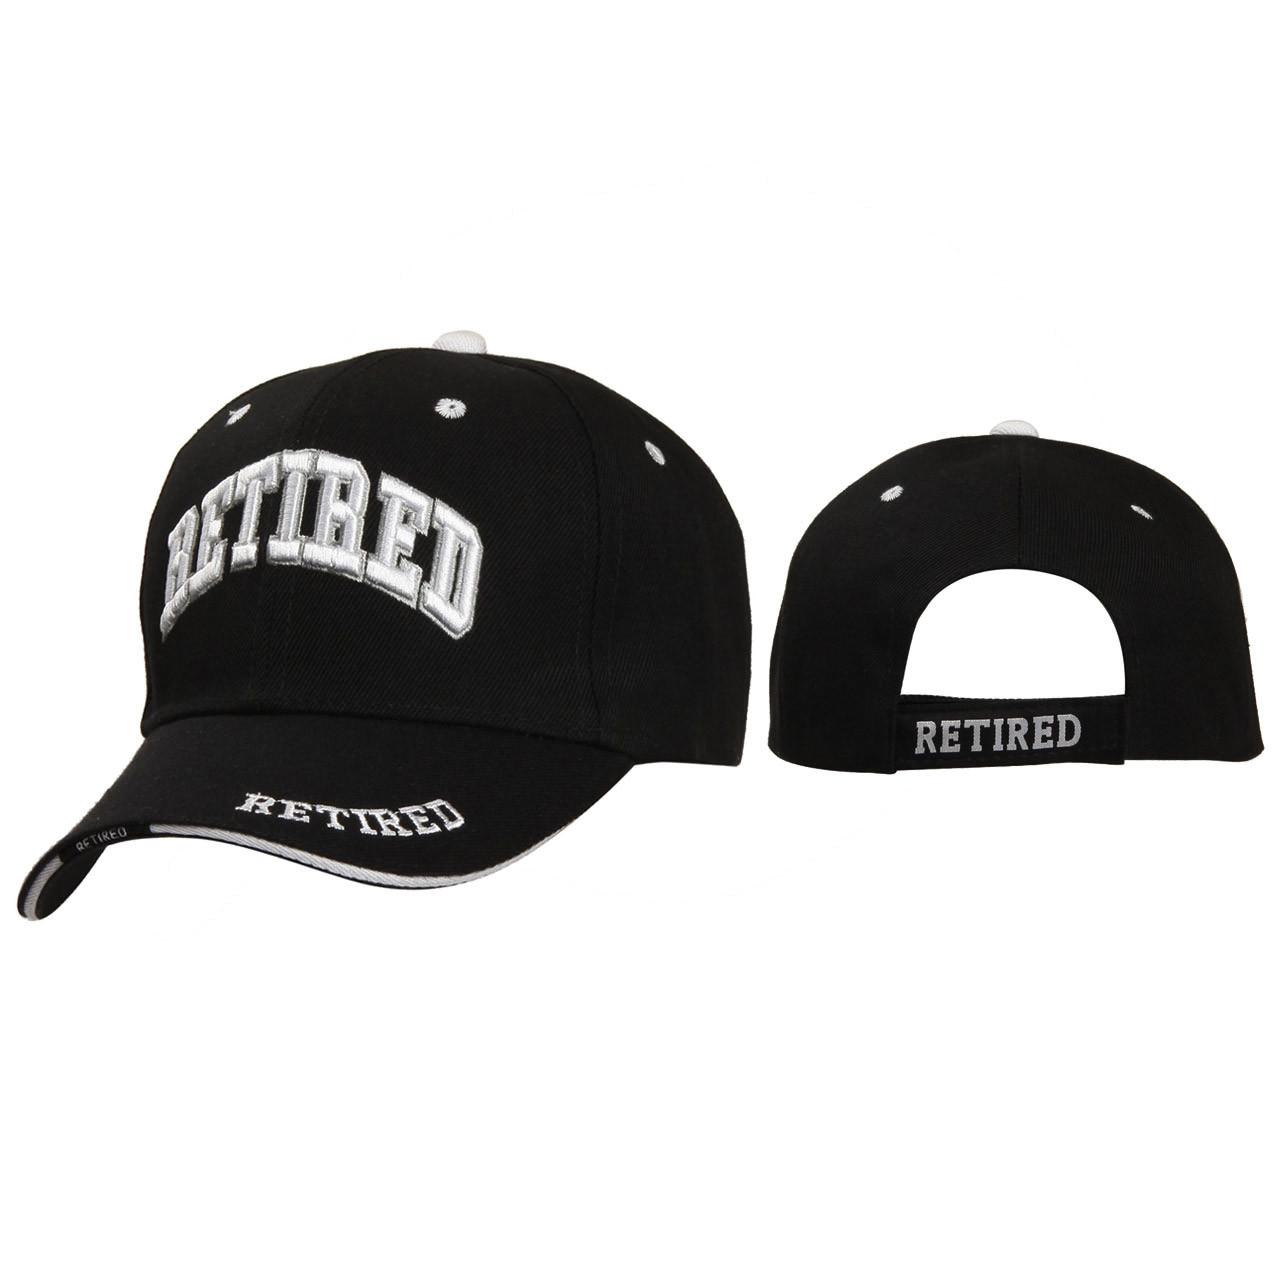 Wholesale Caps ~ Retired ~ Black